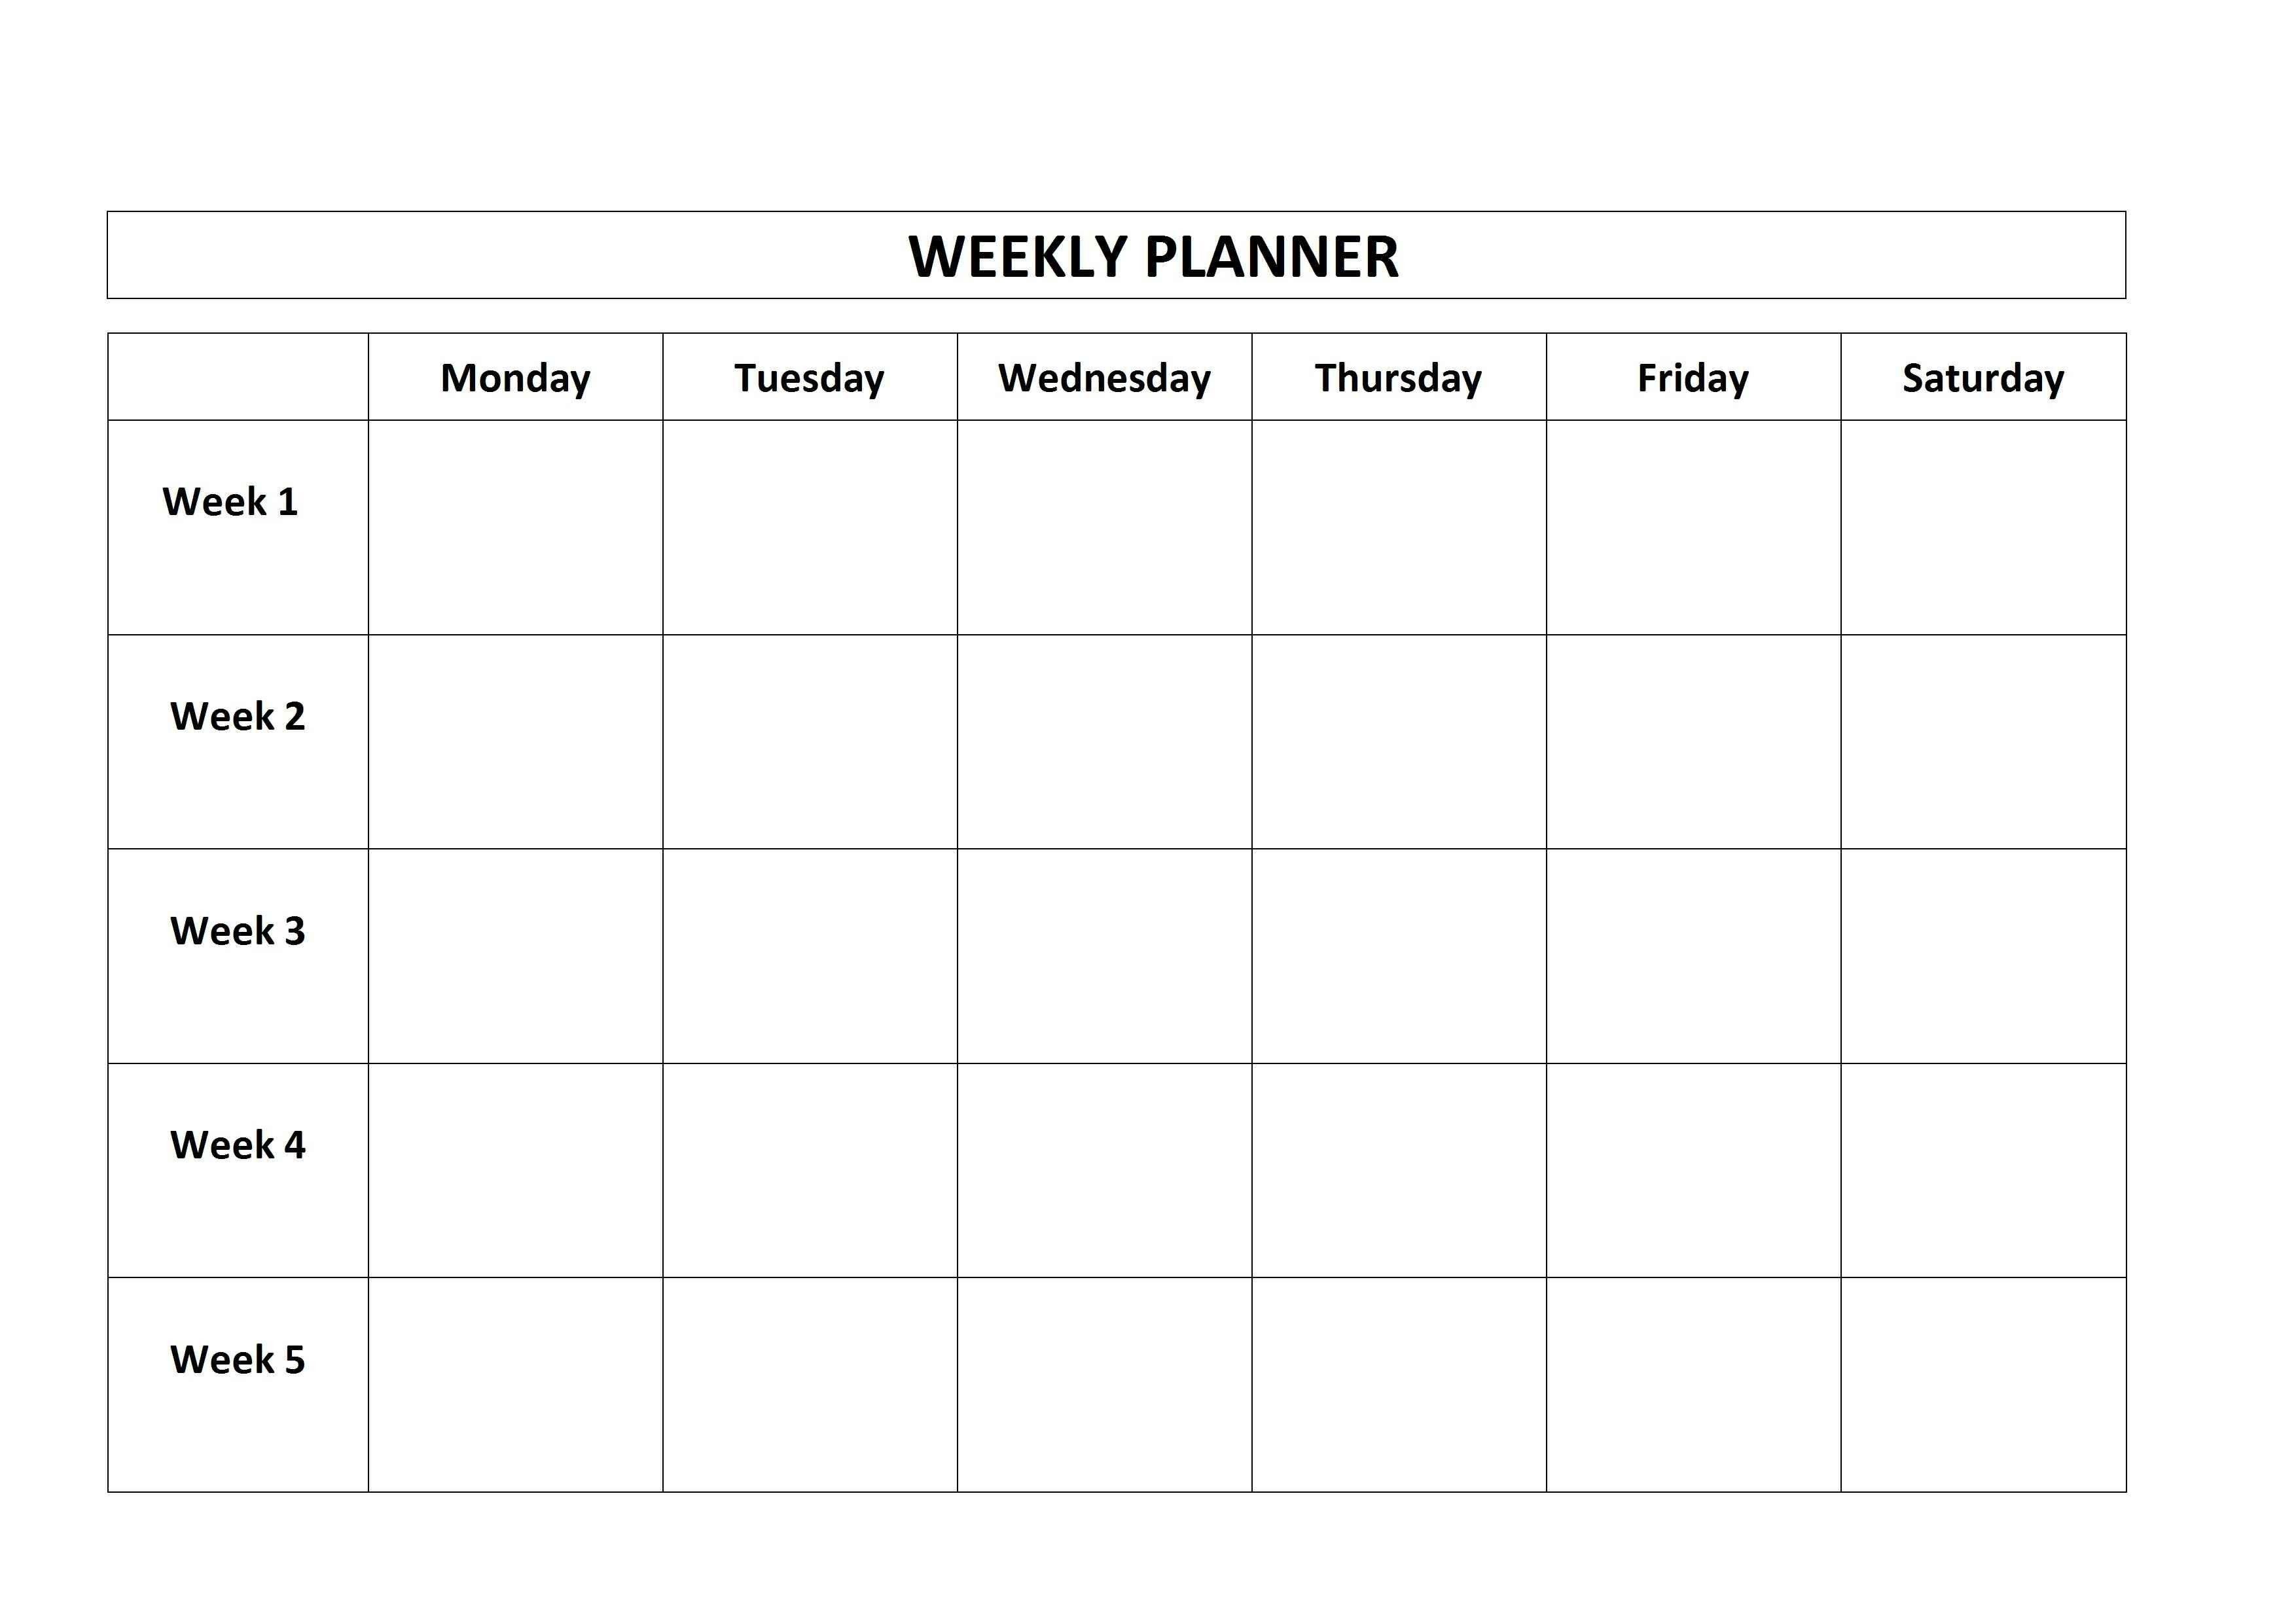 5 Day Calendar Template  Vaydile.euforic.coblank Calendar intended for Free Printable 5 Day Calendar